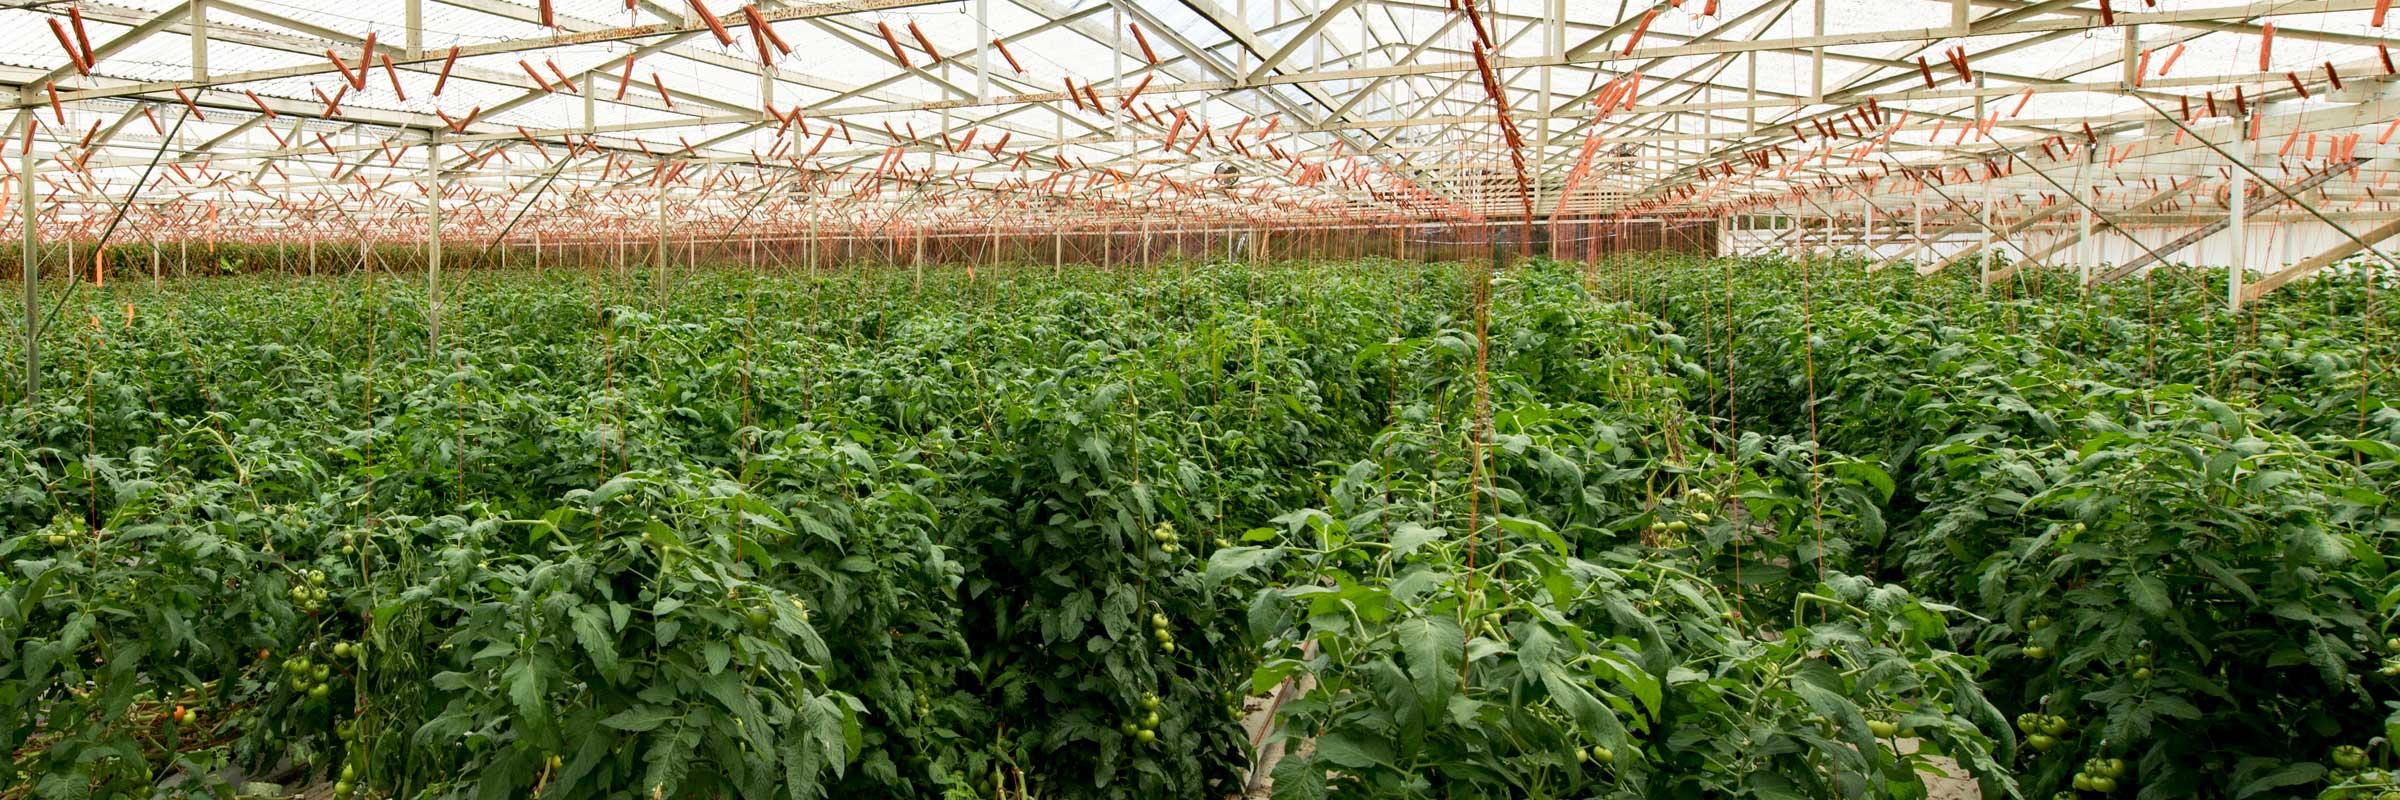 Kawamata Hydroponic Tomato plants